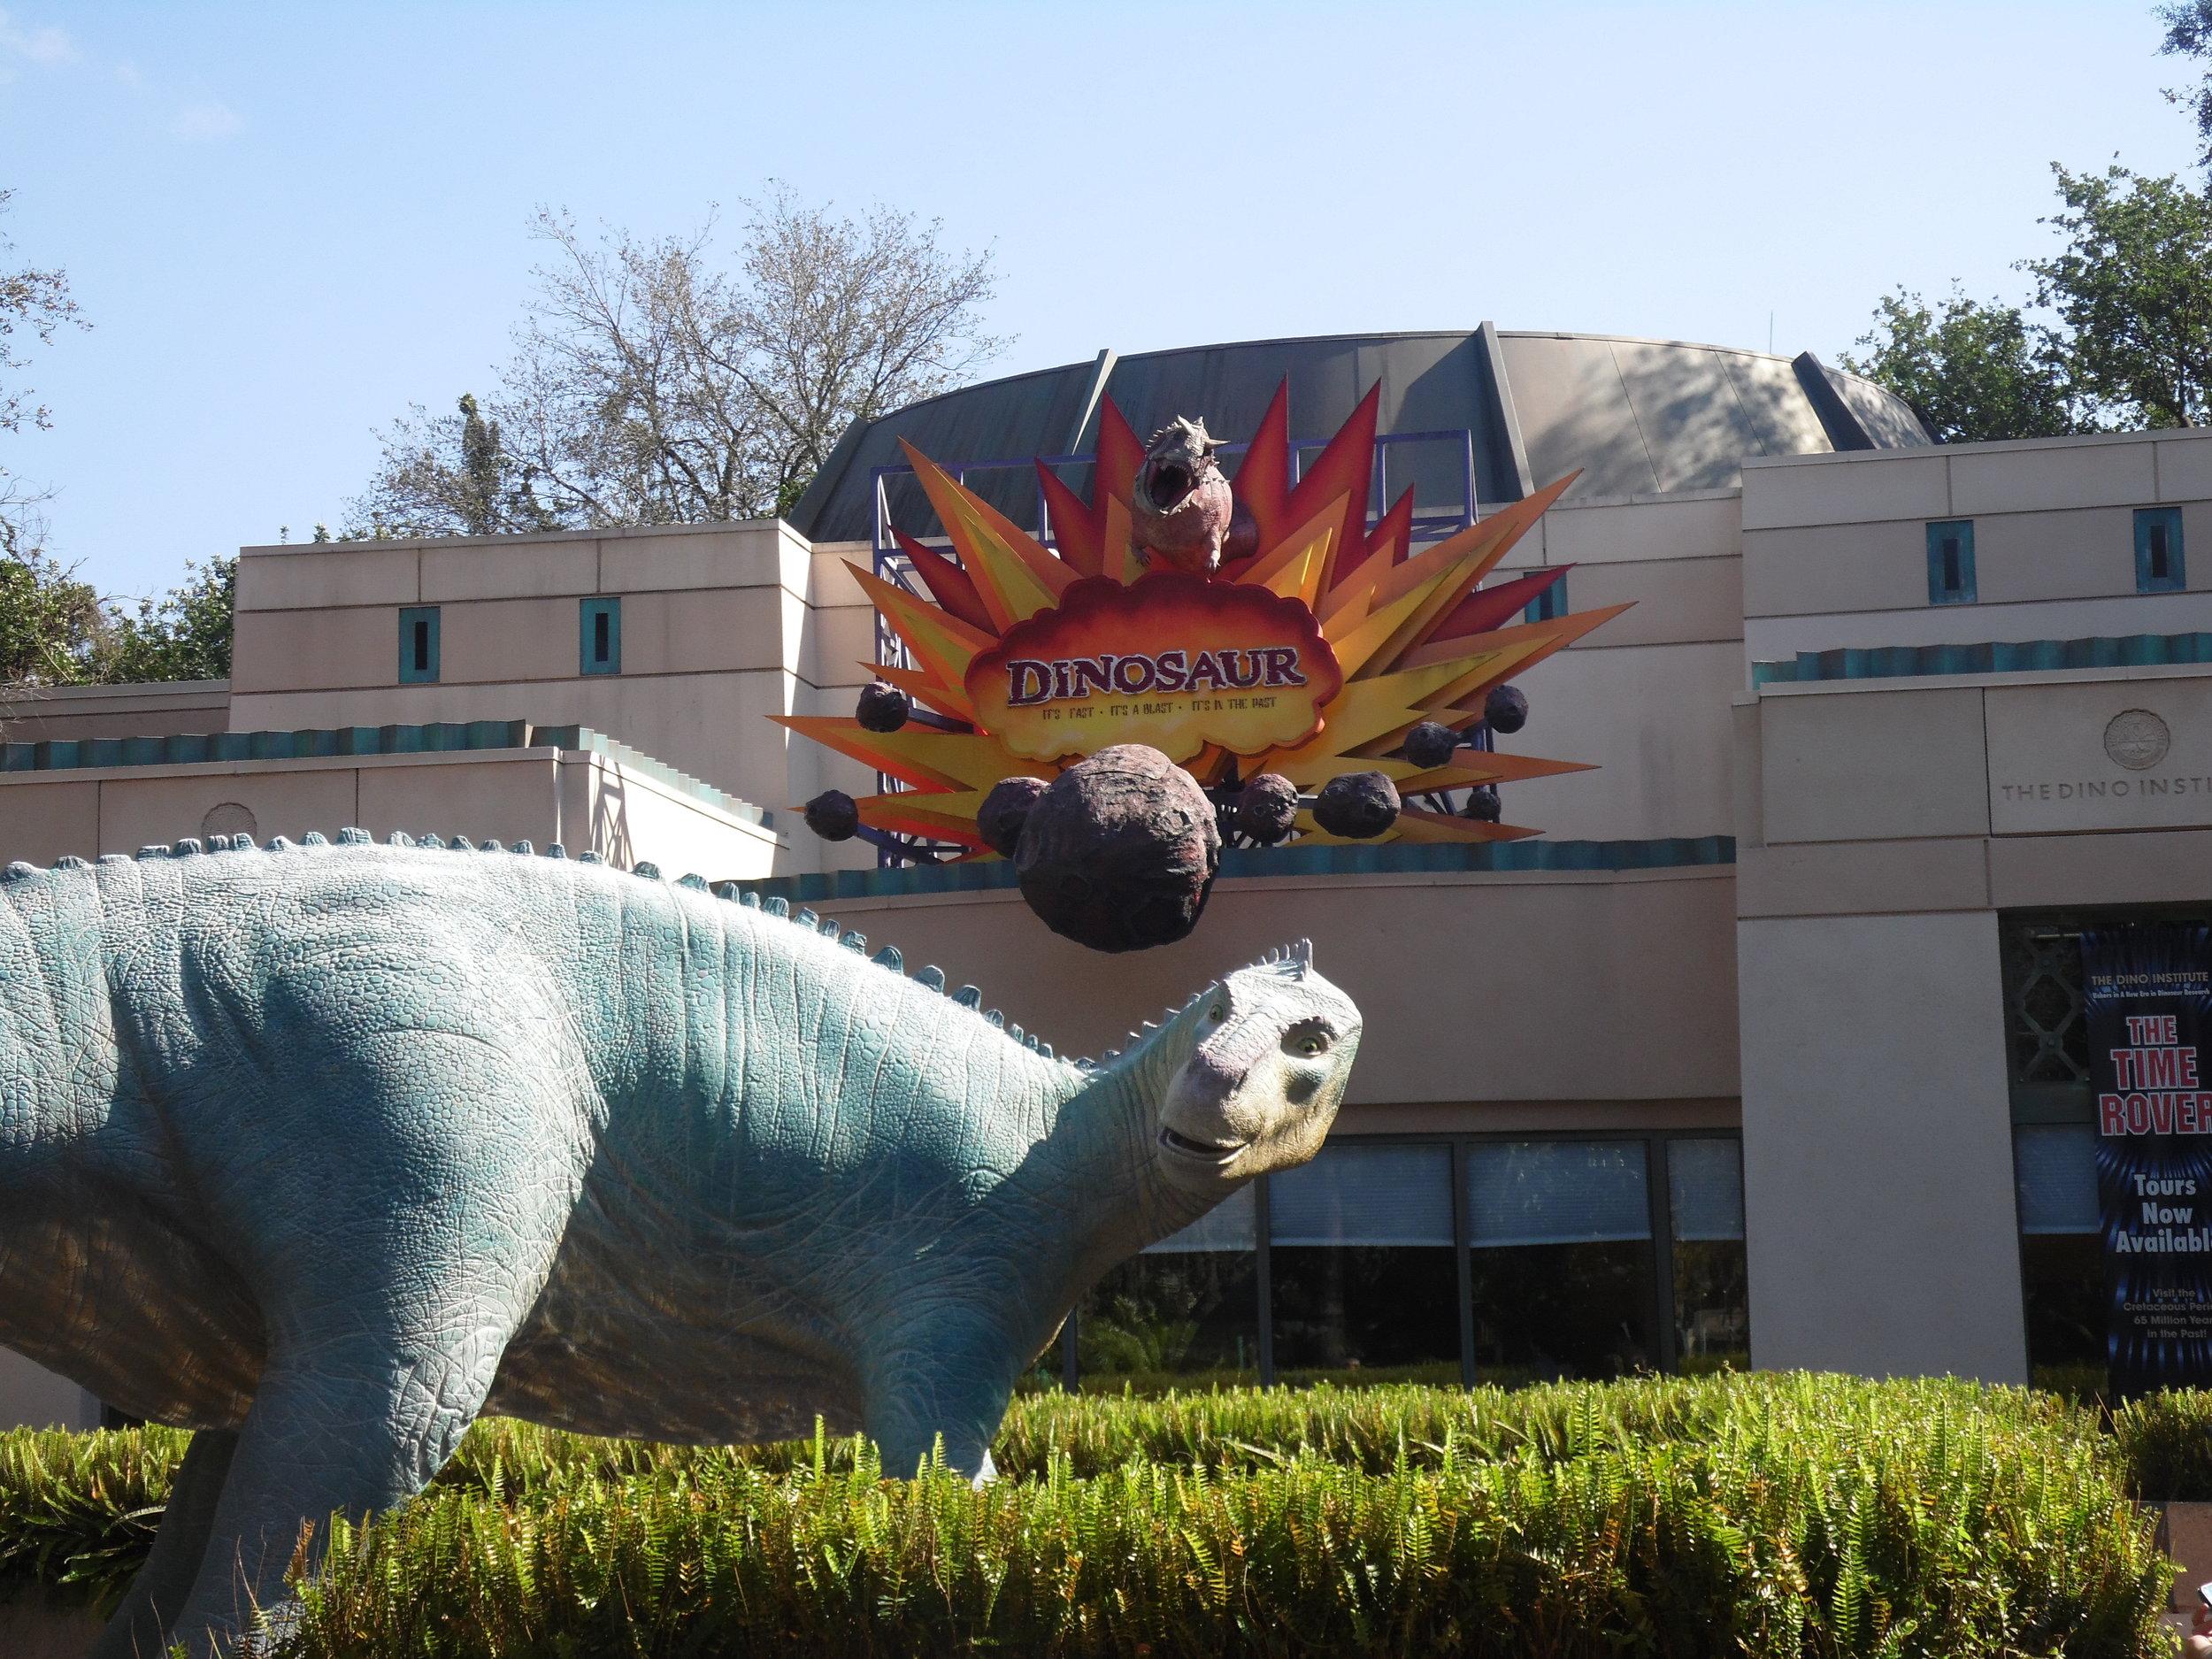 Dinosaur, DinoLand U.S.A., Disney's Animal Kingdom